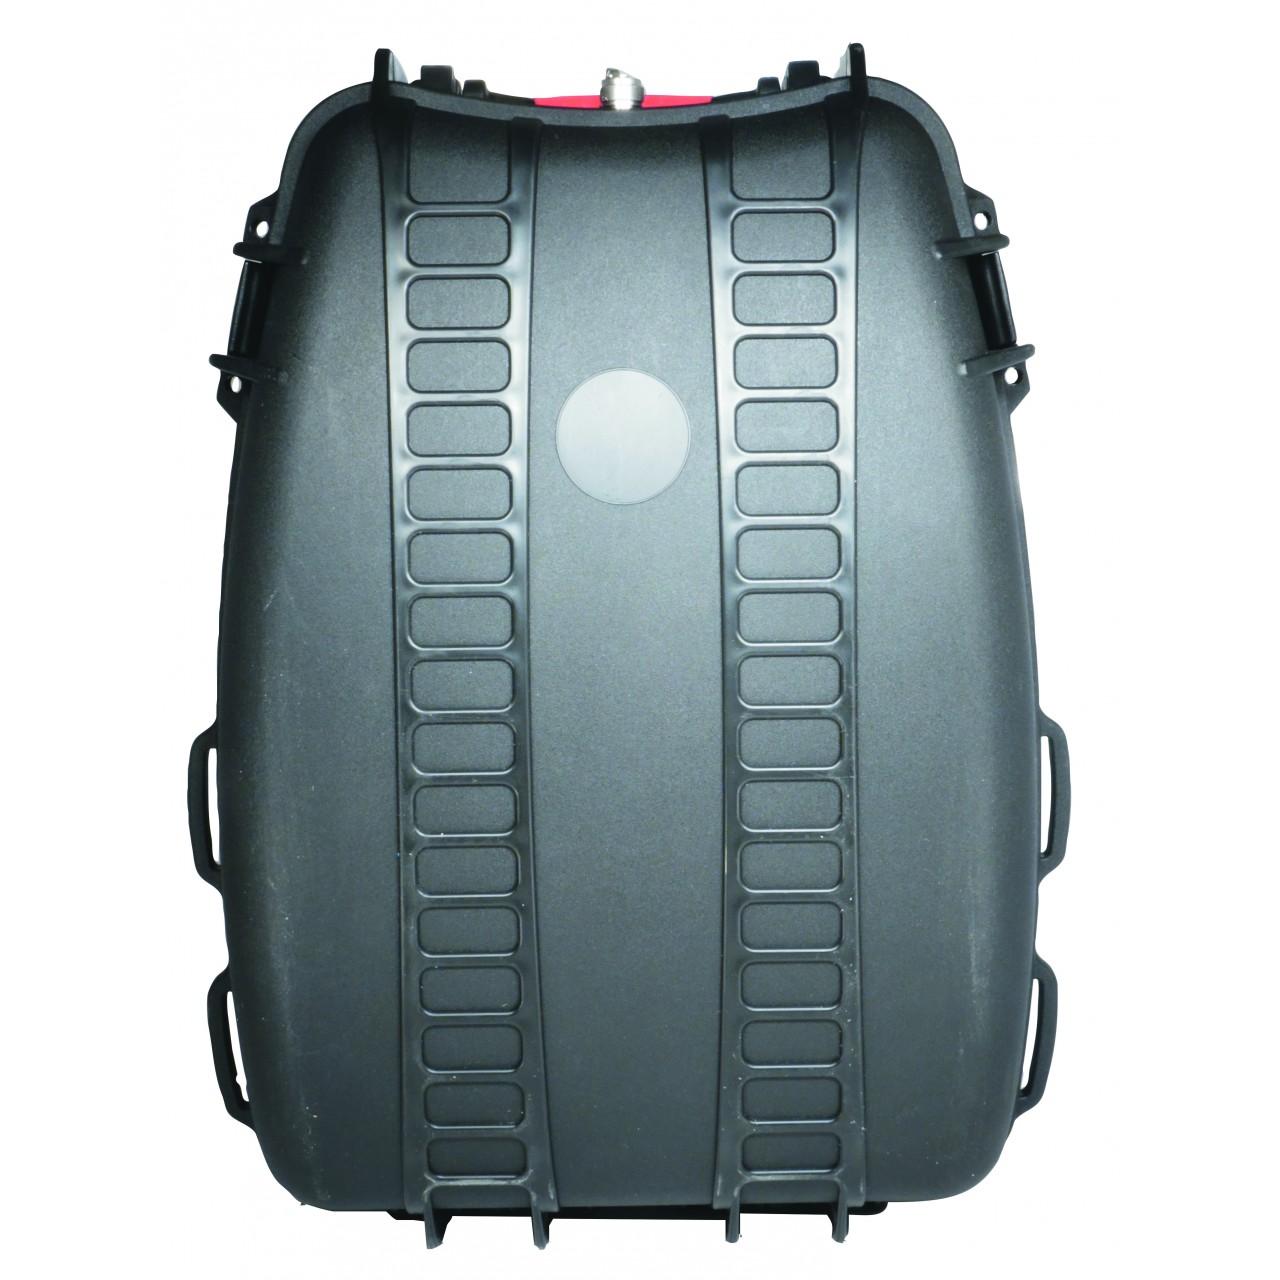 IF-F5012 BACKPACK Mobiles - ICOM